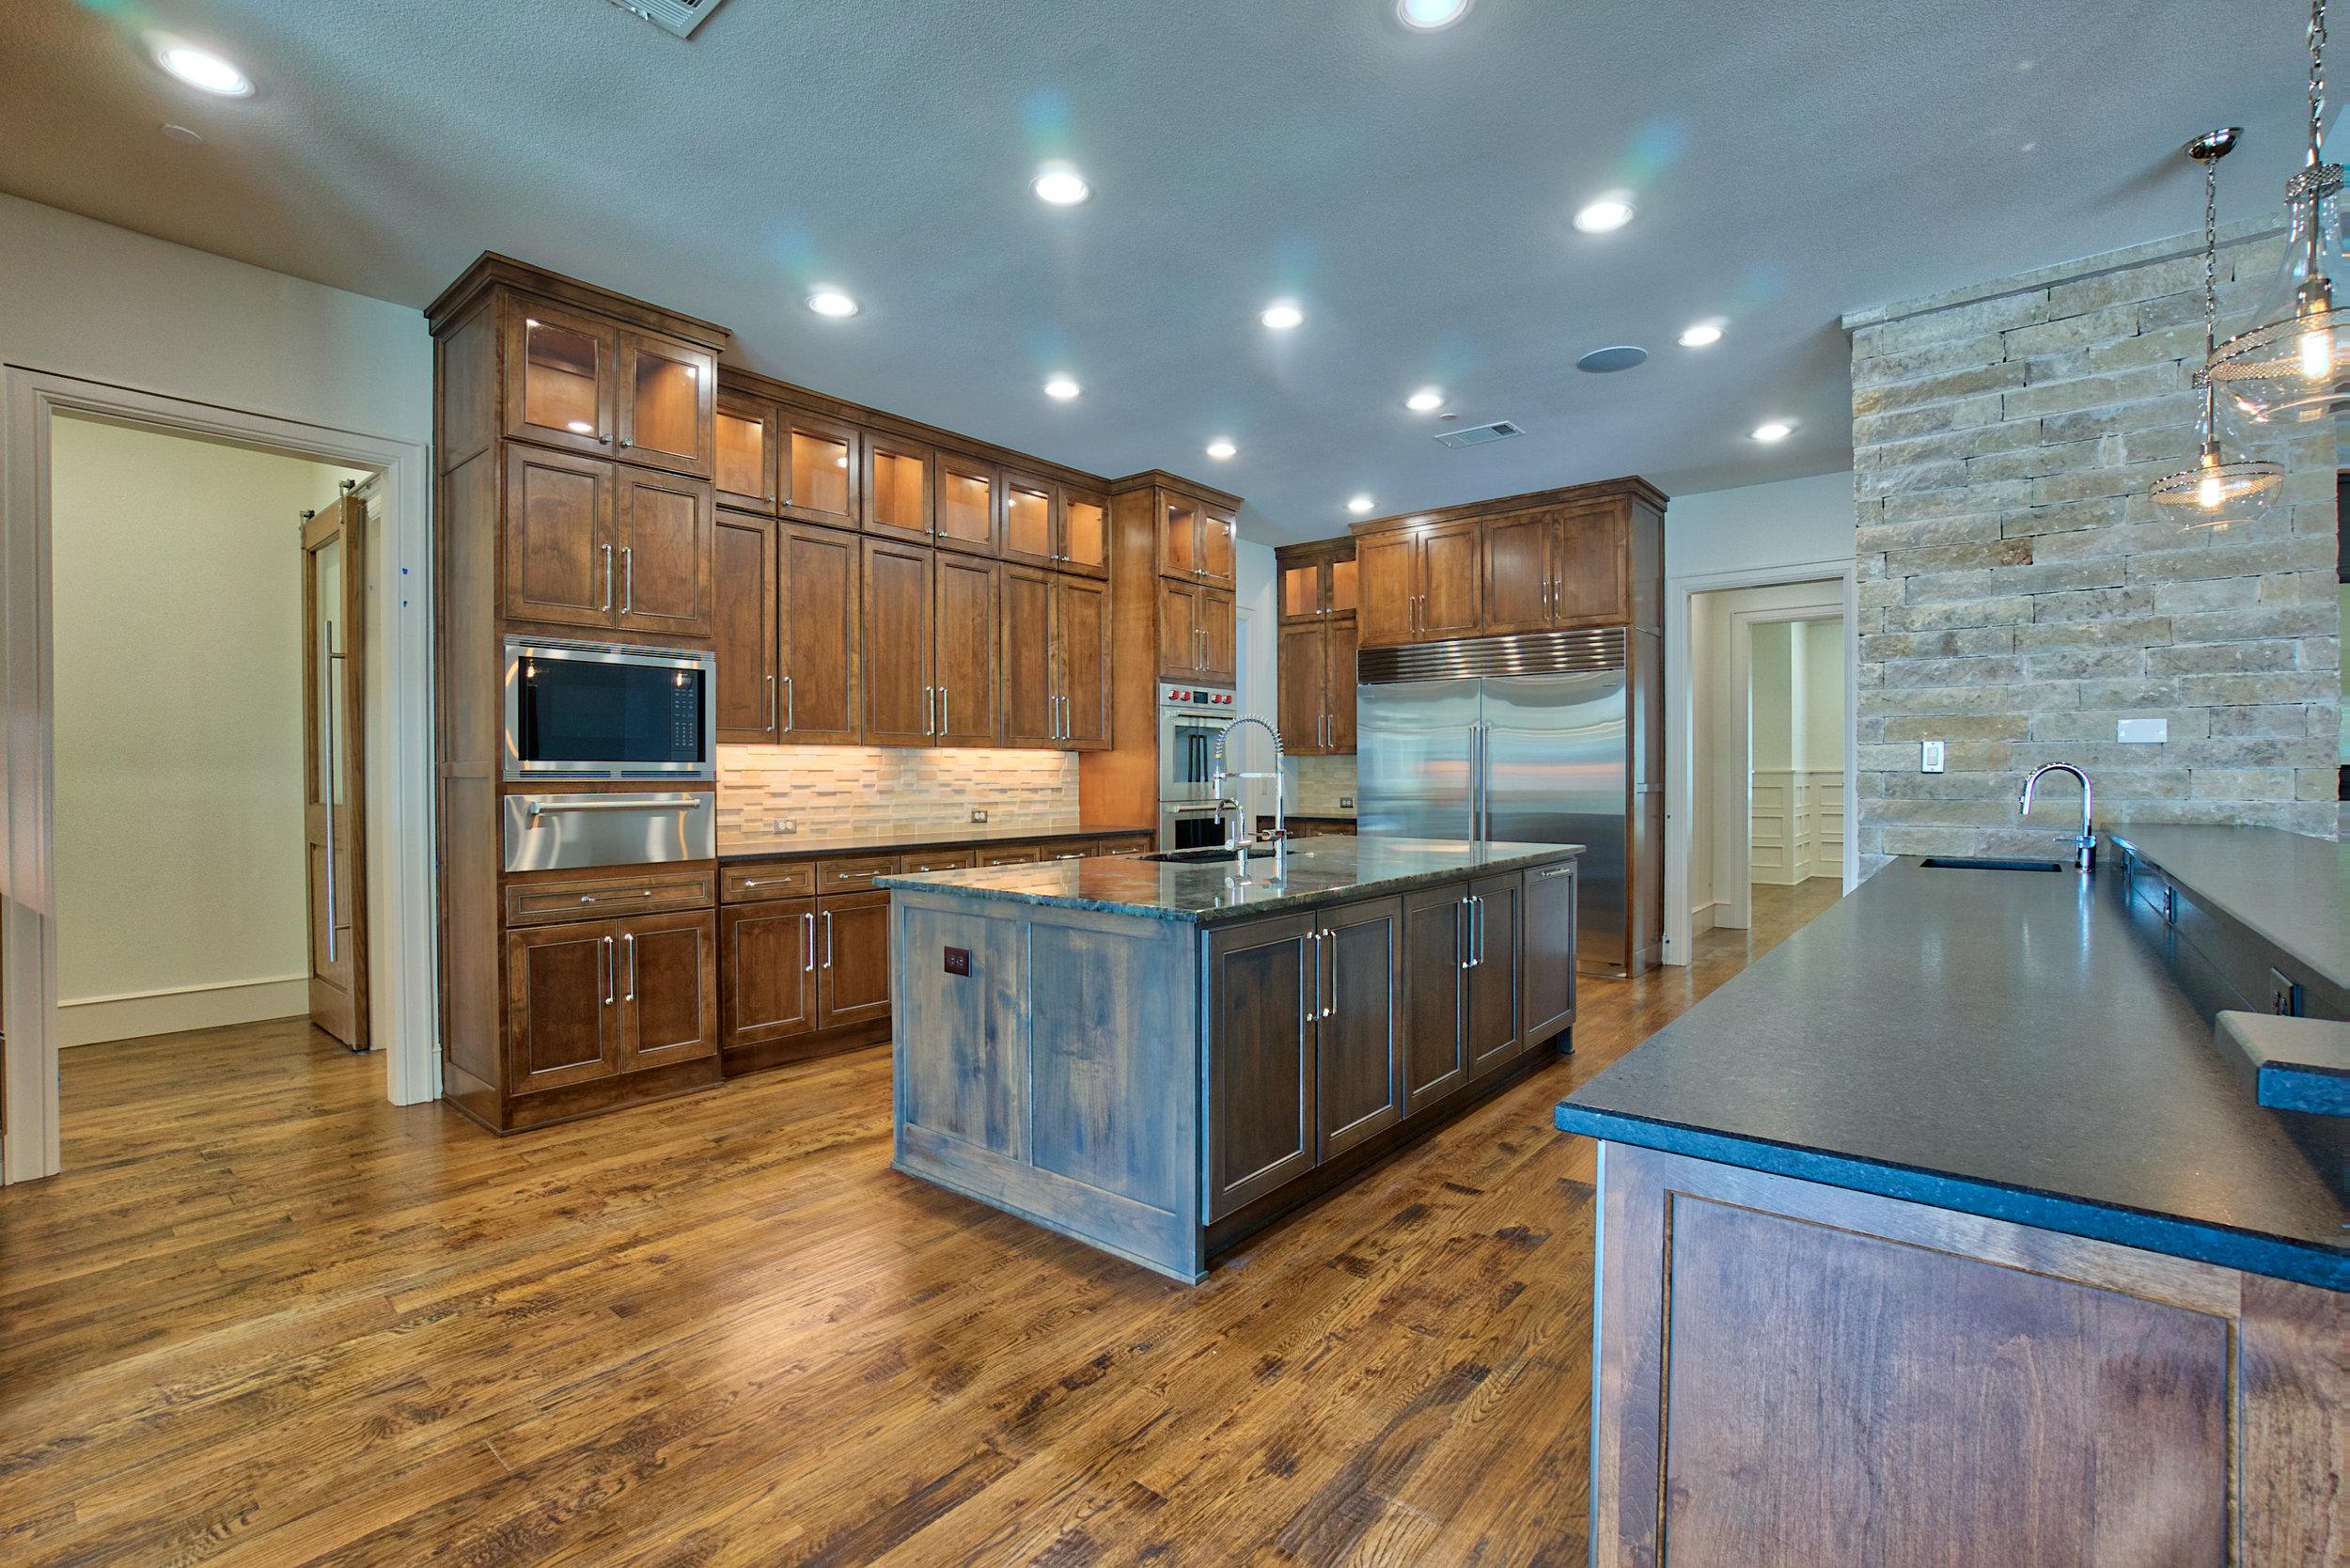 9 kitchen 2.jpeg